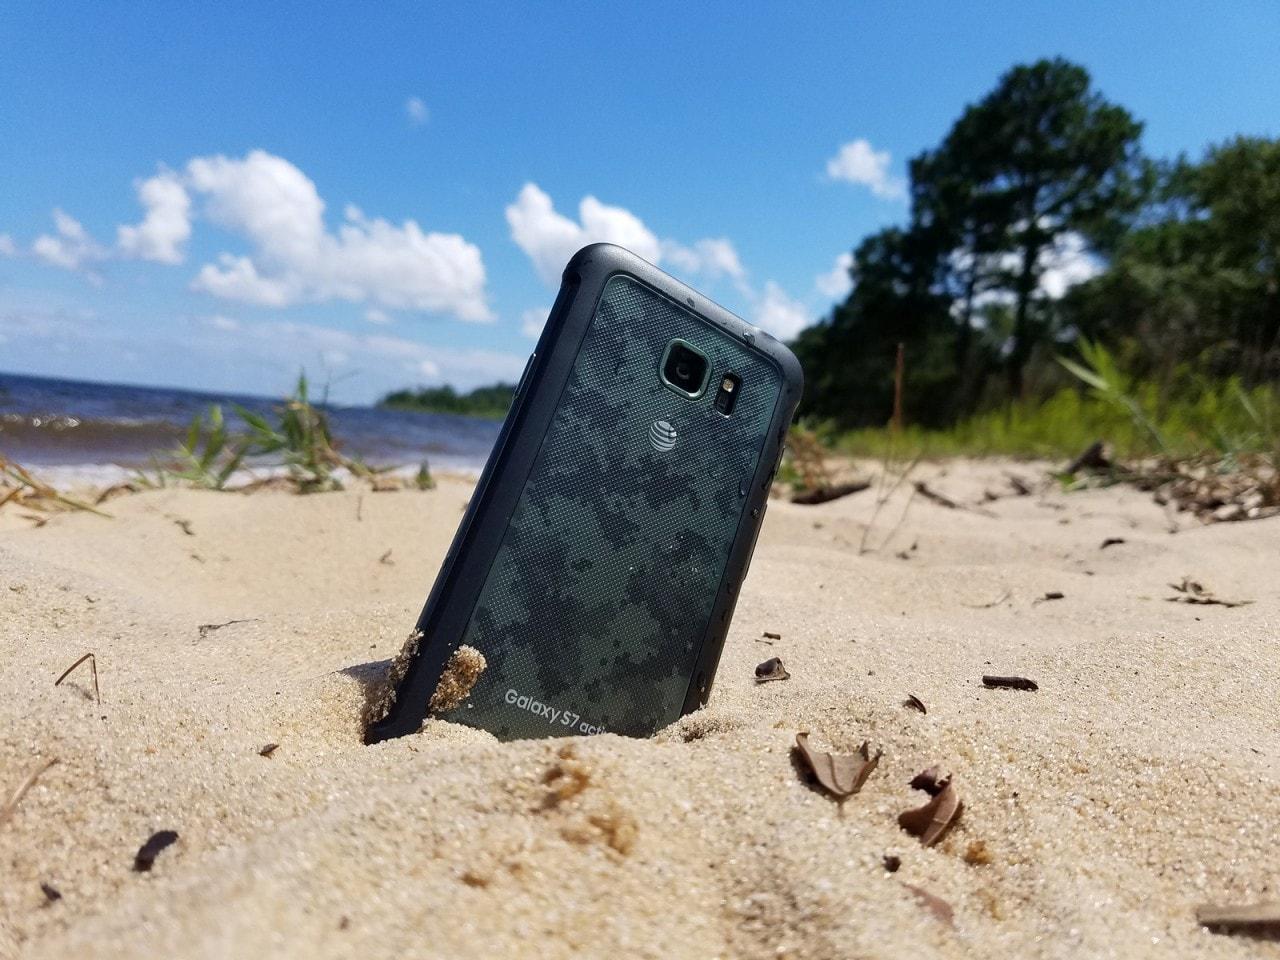 Samsung Galaxy S7 Active Final